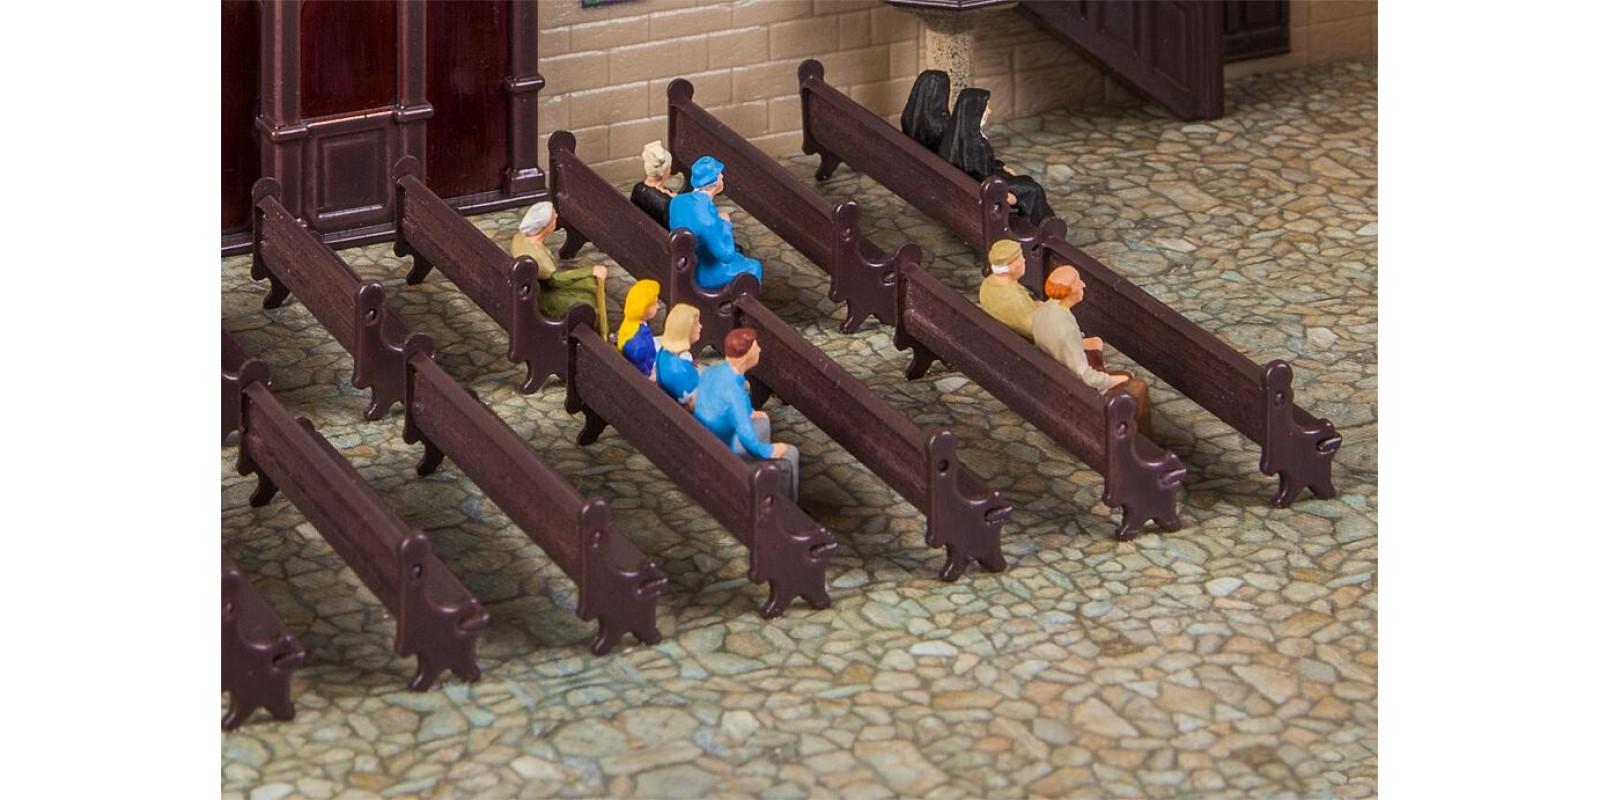 FA180989 7 Church benches